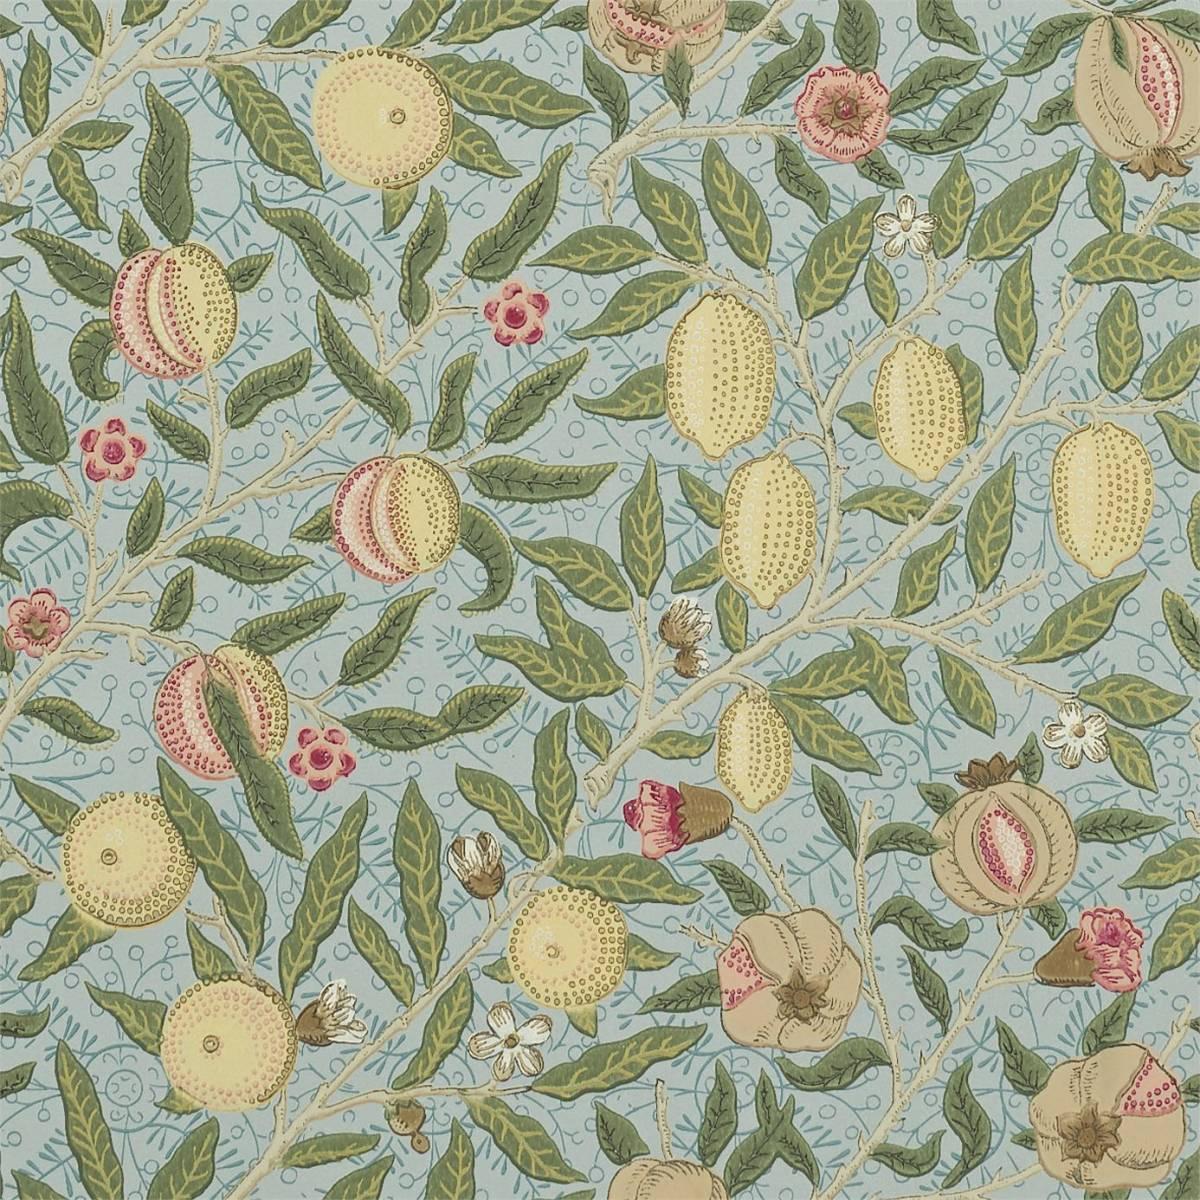 Fruit Wallpaper SlateThyme 210396 William Morris